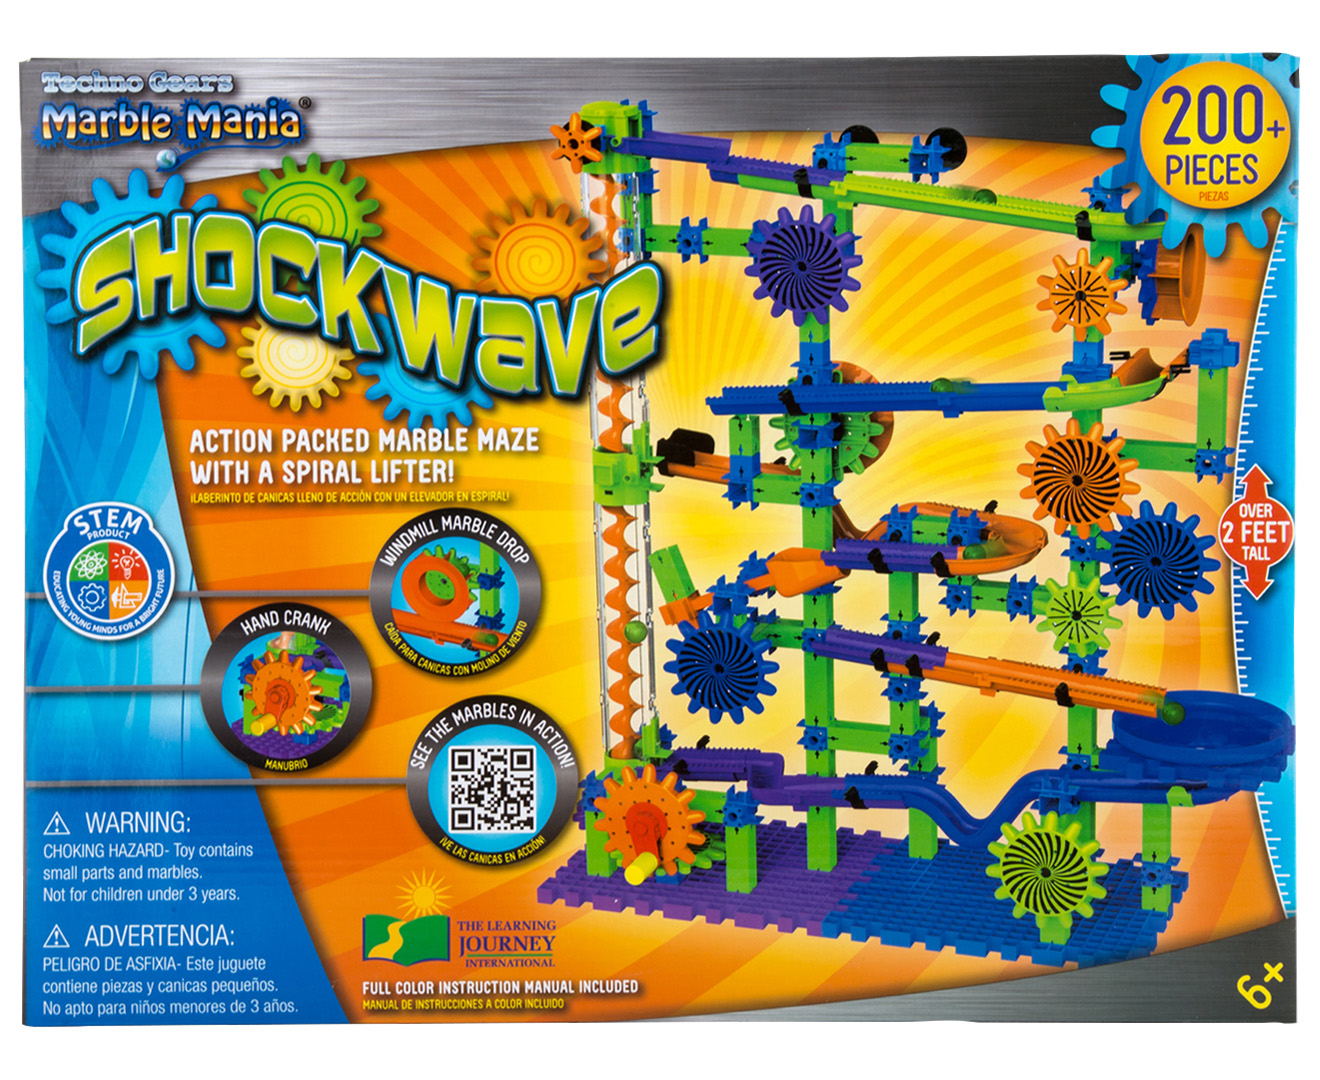 Techno Gears Marble Mania Shockwave Playset Mumgo Com Au